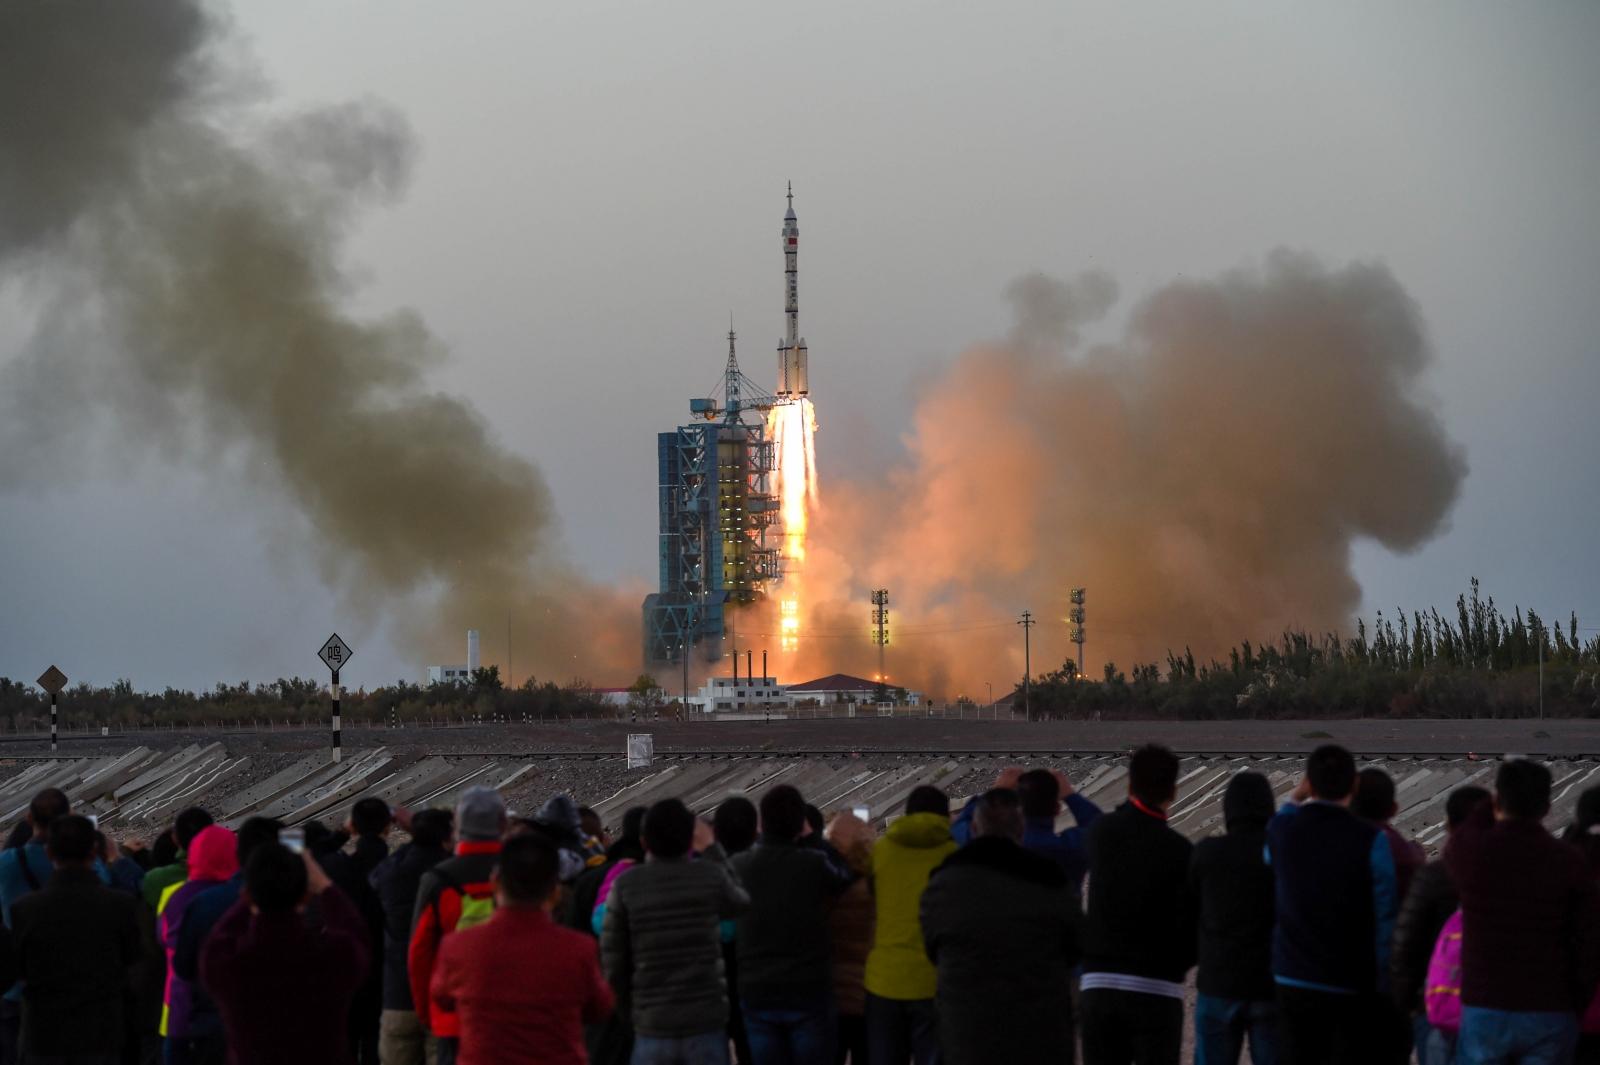 Shenzhou-11 manned spacecraft china